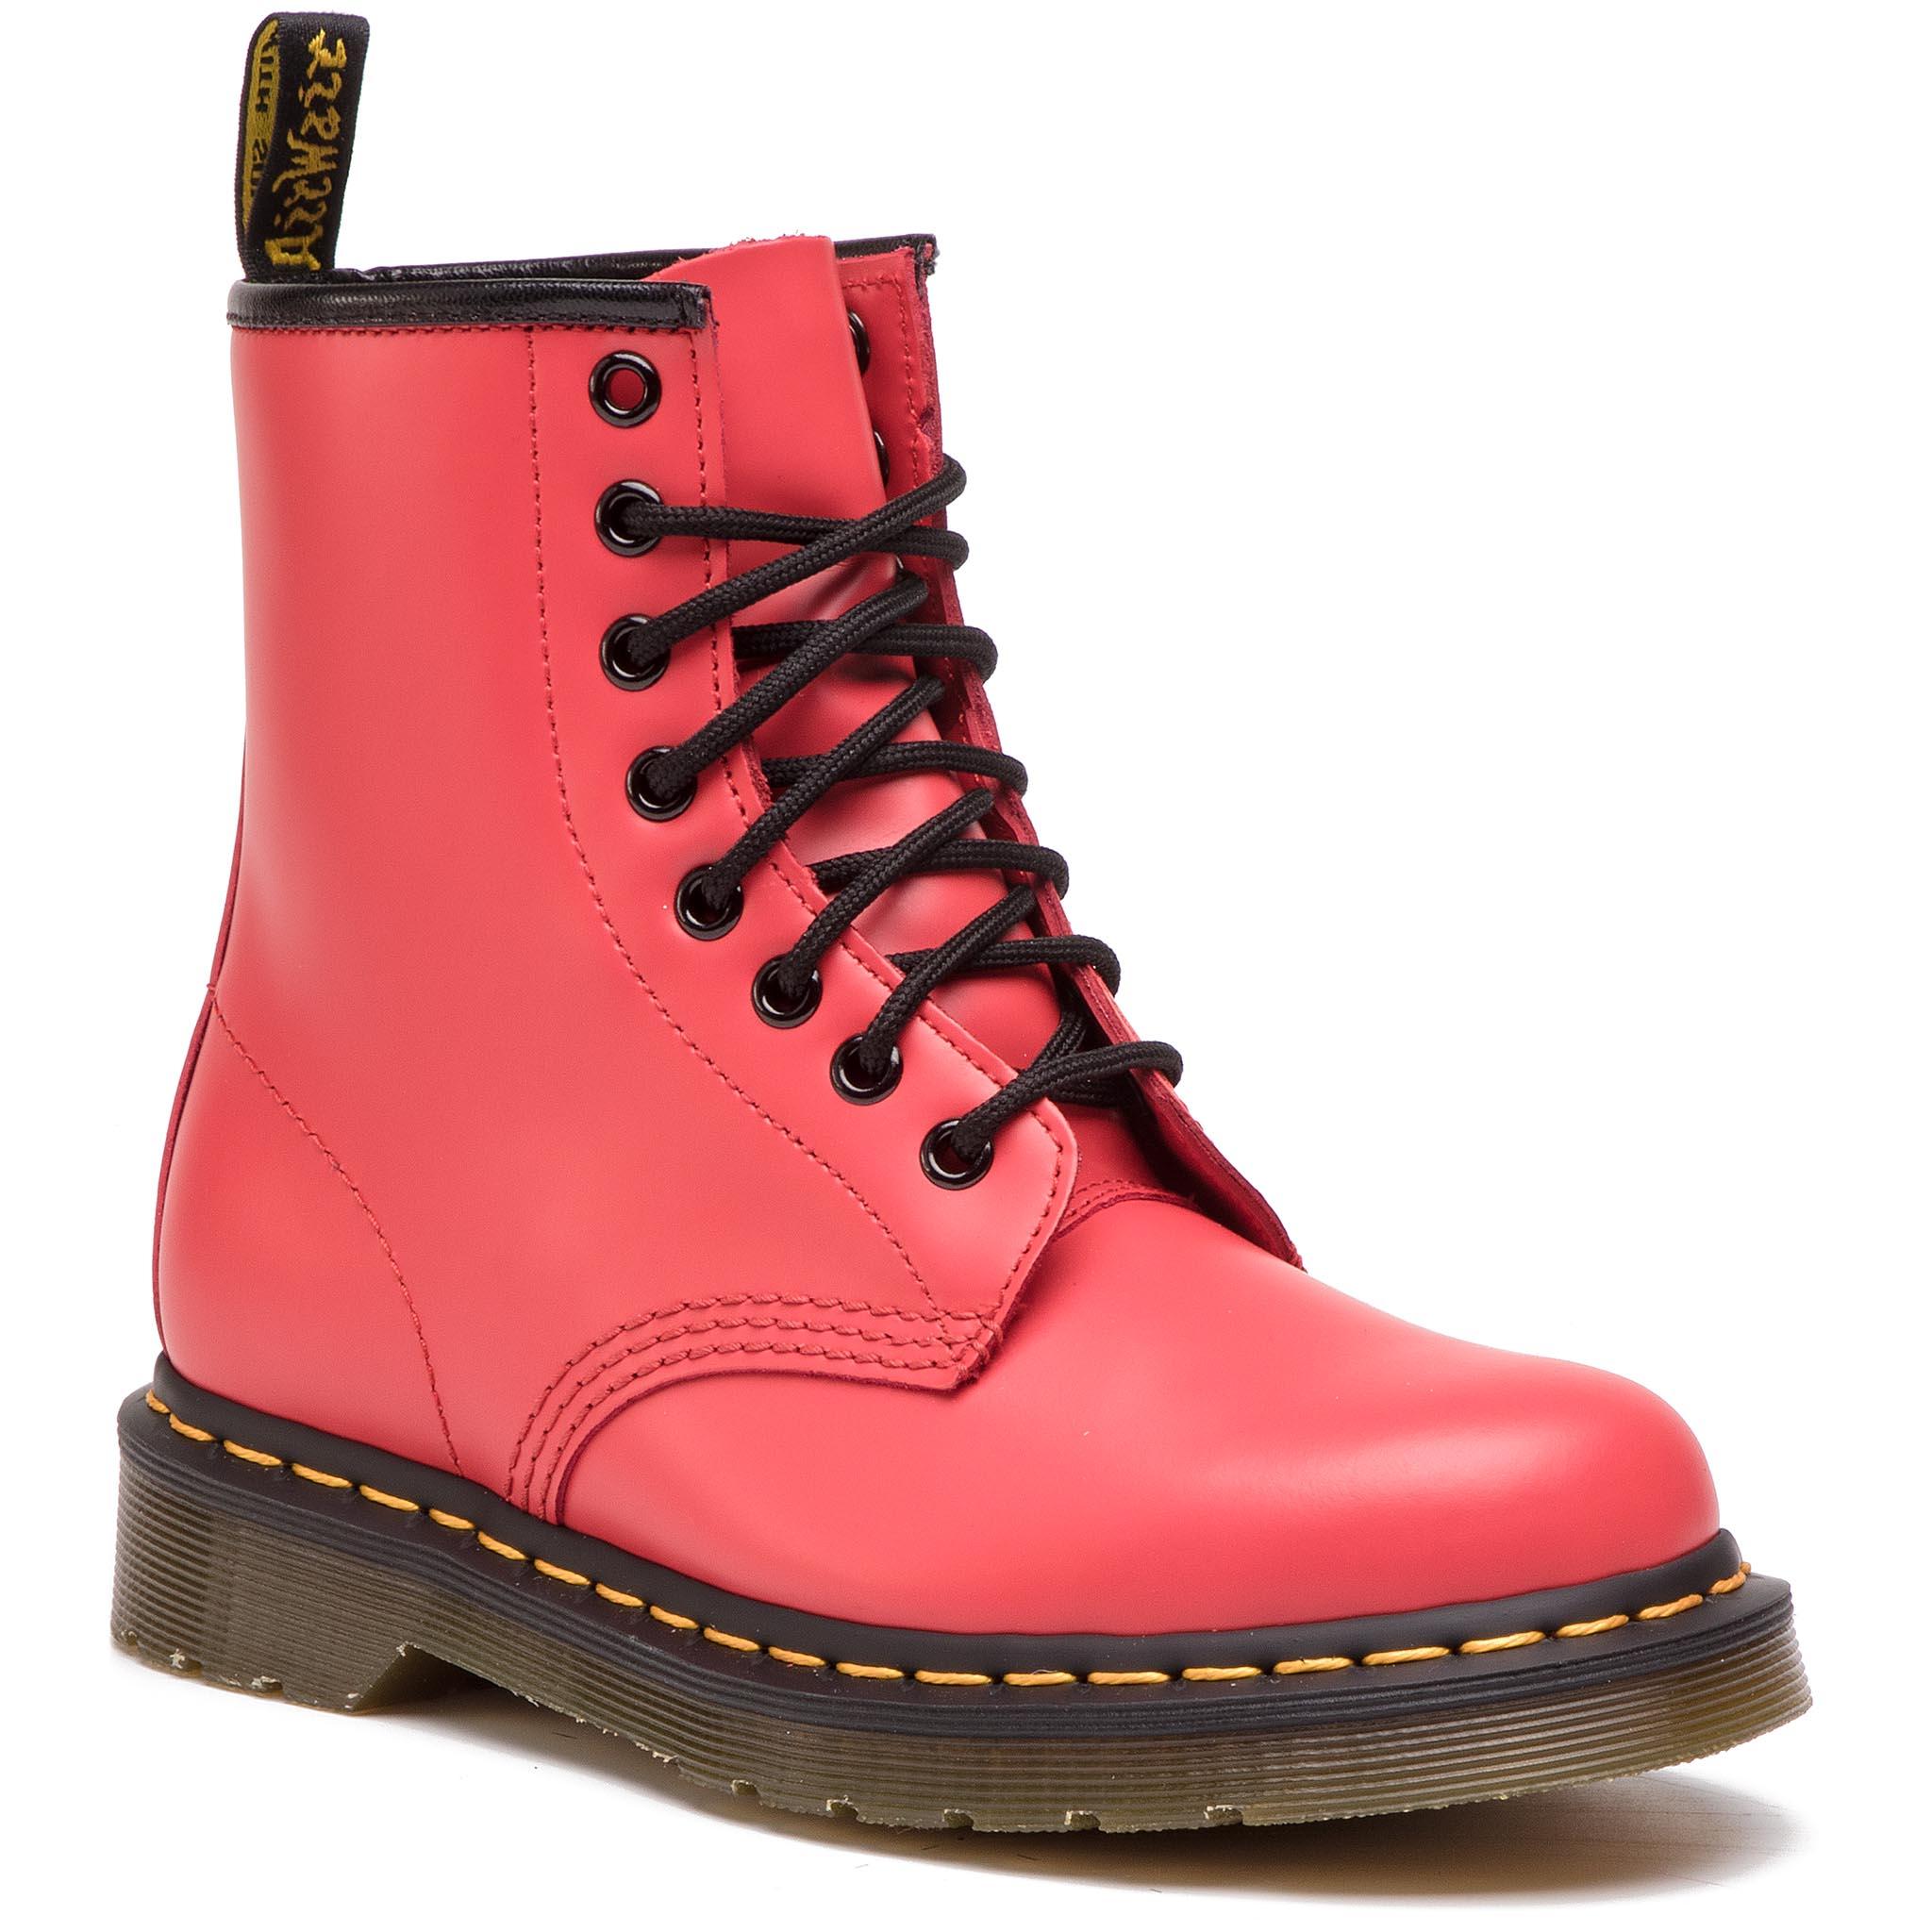 25c15ea15dc8 Combat Boots DR. MARTENS - 1460 Pascal Glitter 24839602 Red/ Fine ...